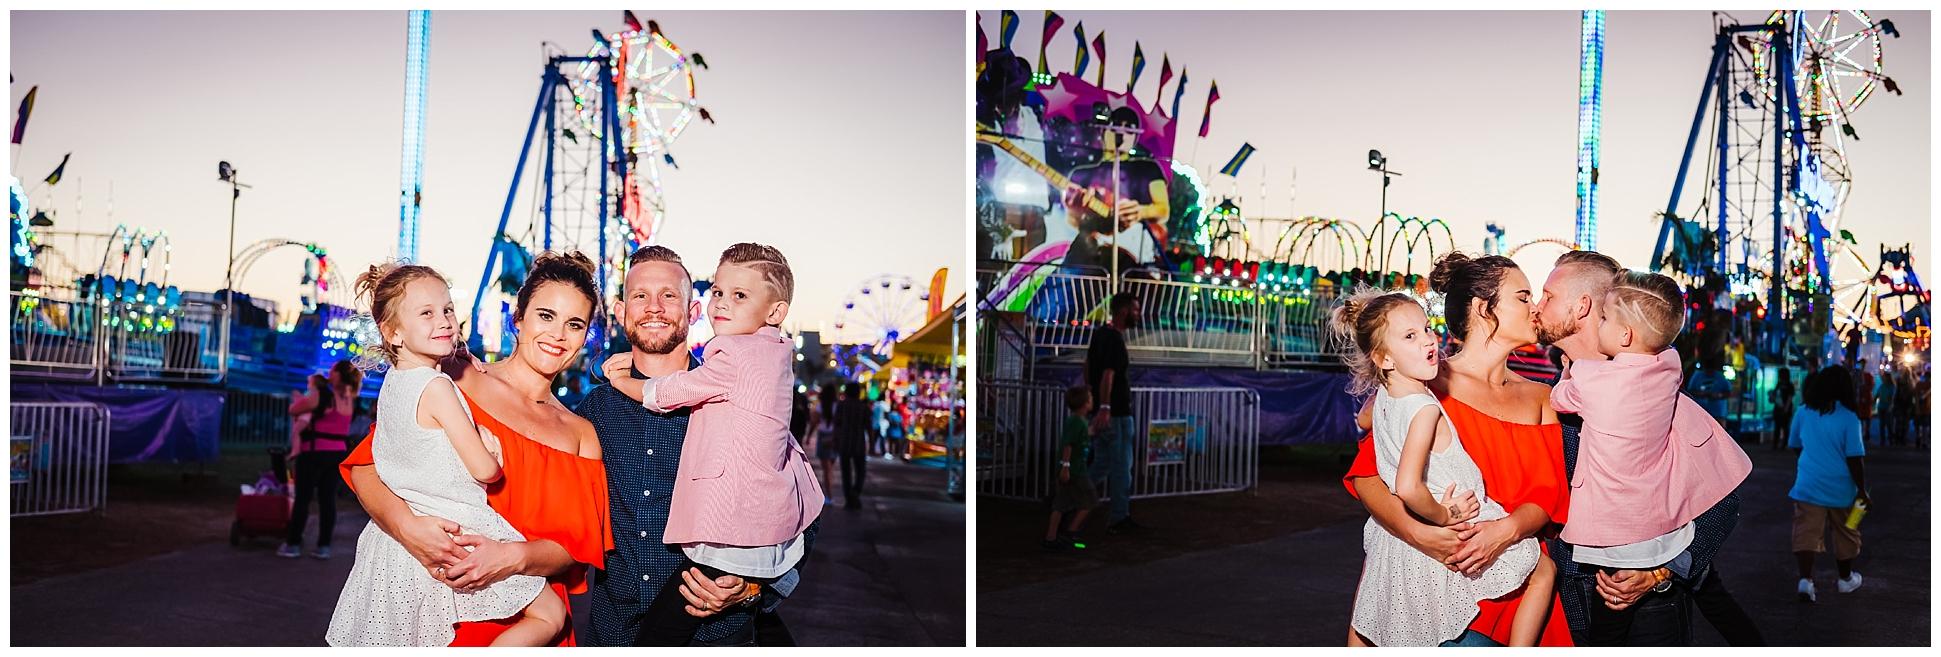 Tampa-colorful-fair-amusement park-family session_0042.jpg